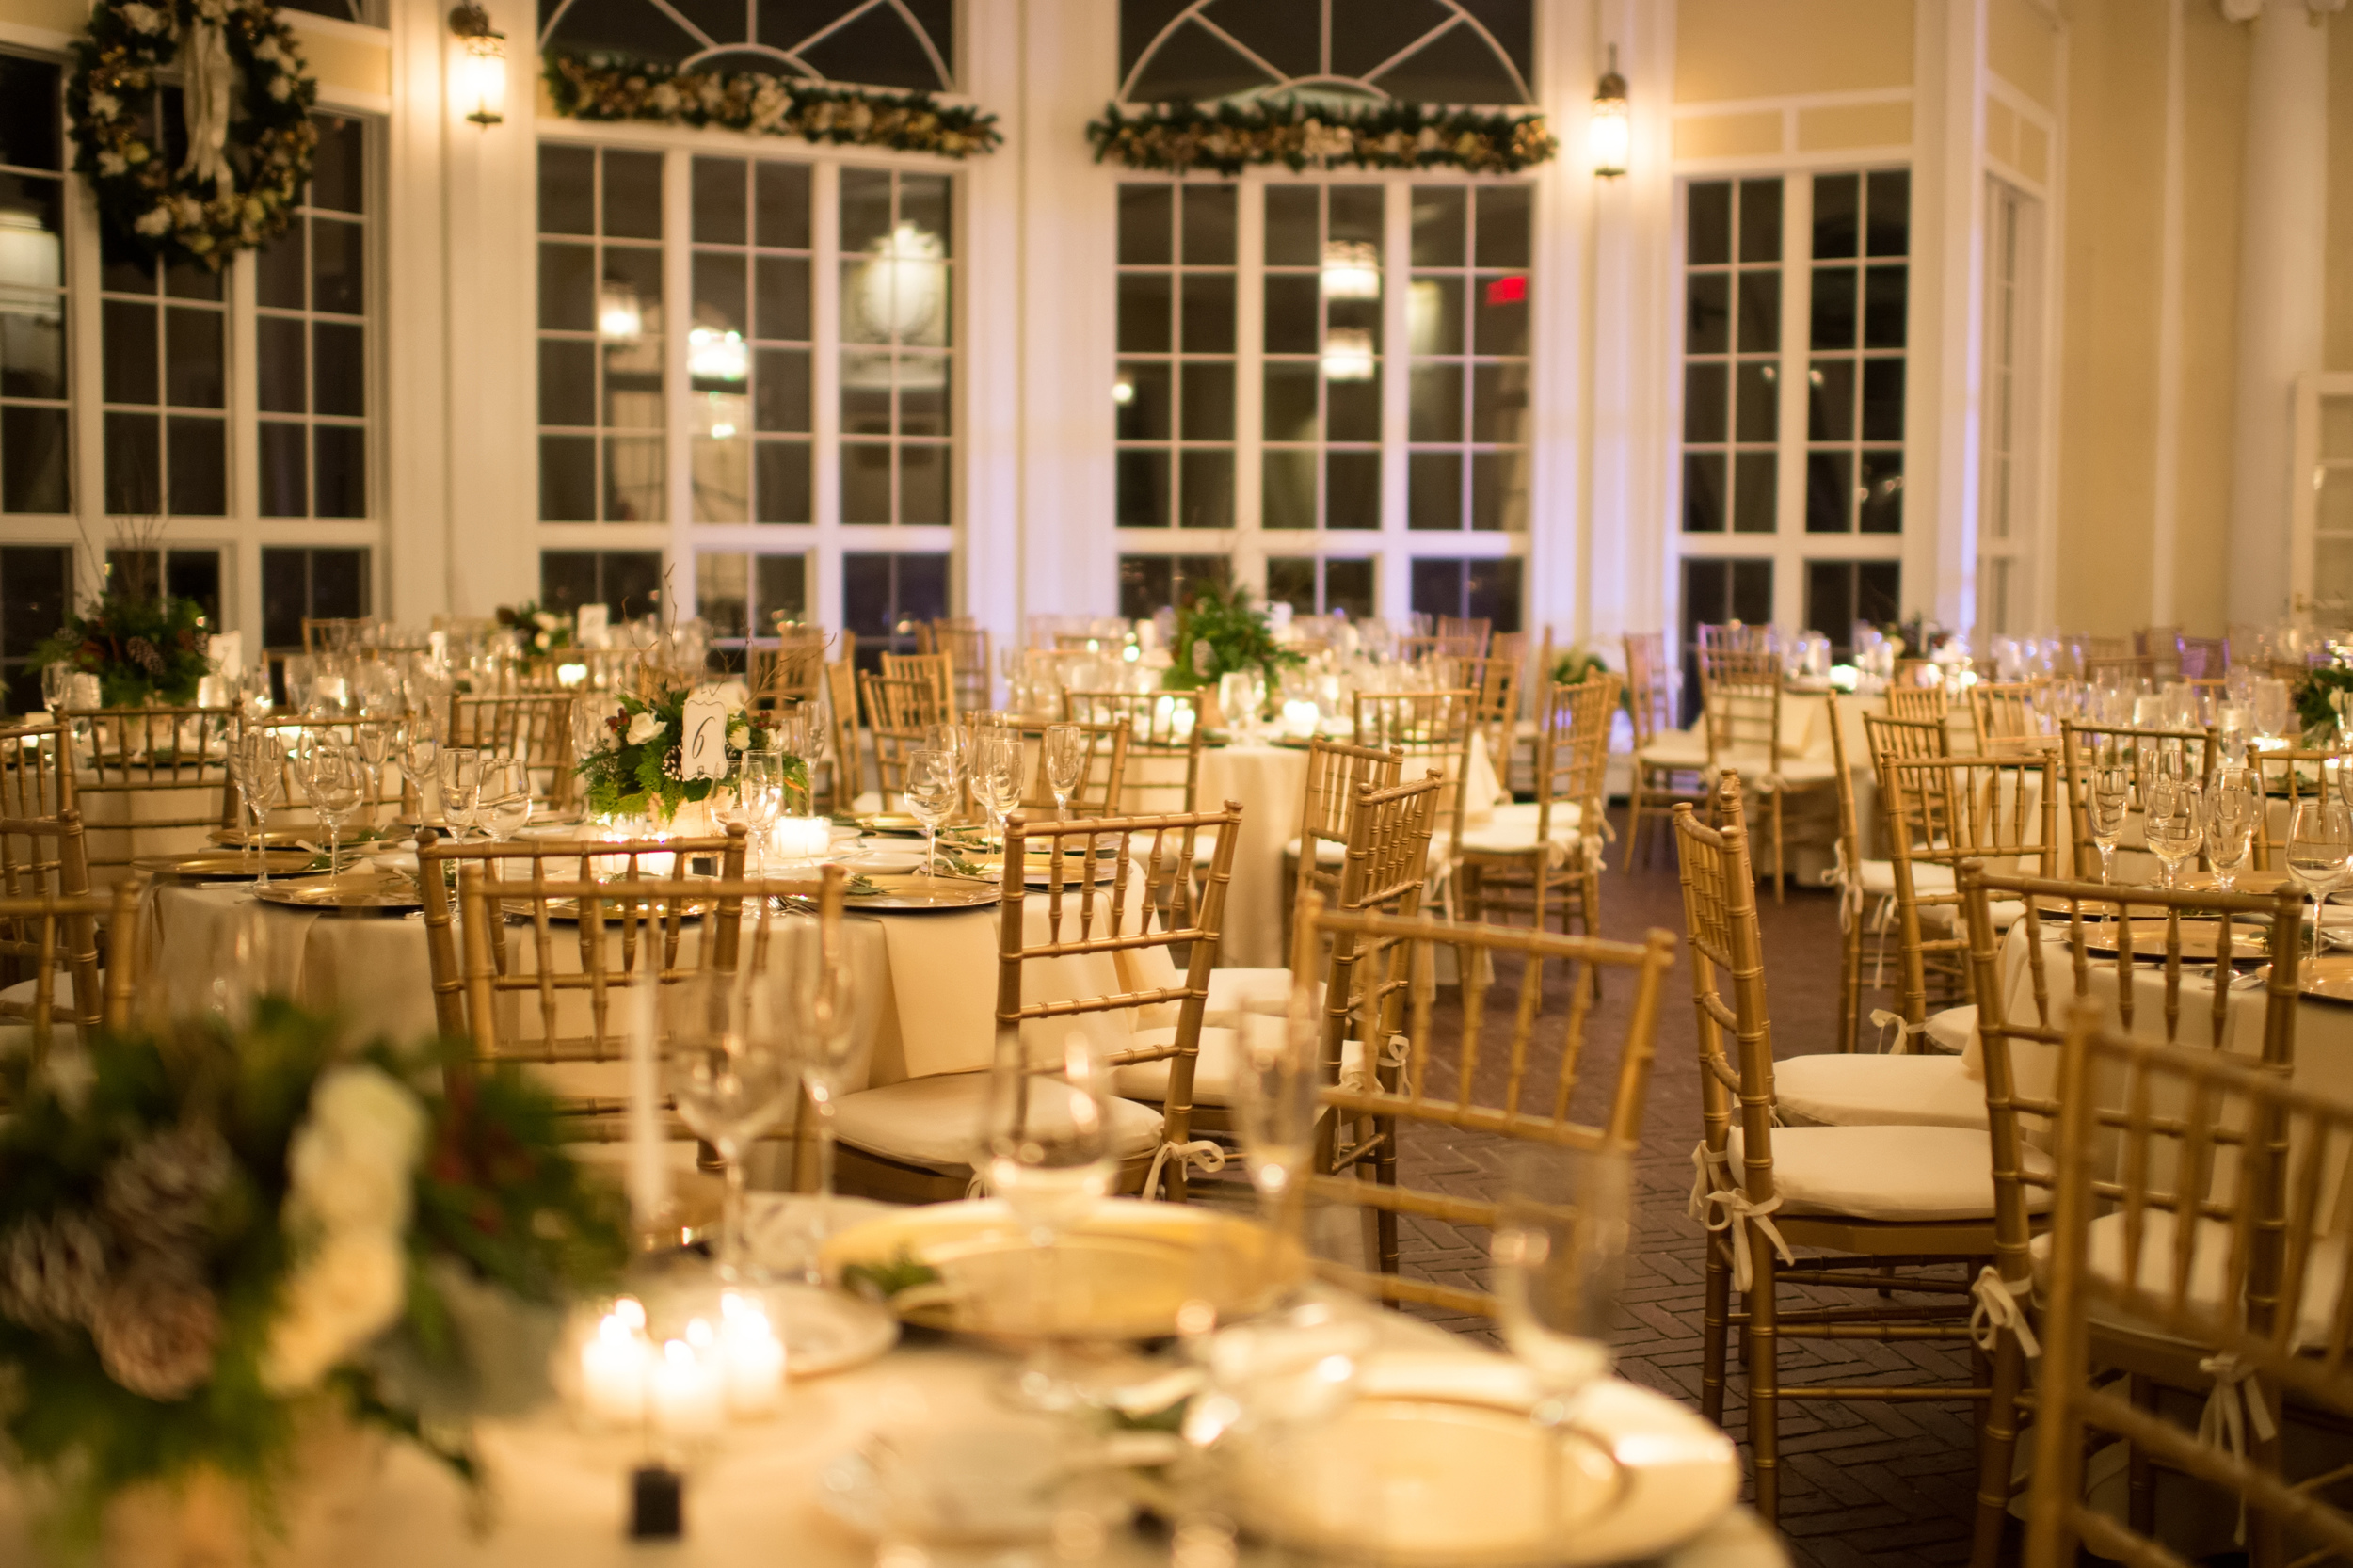 Tupper Manor Winter Wedding | The Gallivant